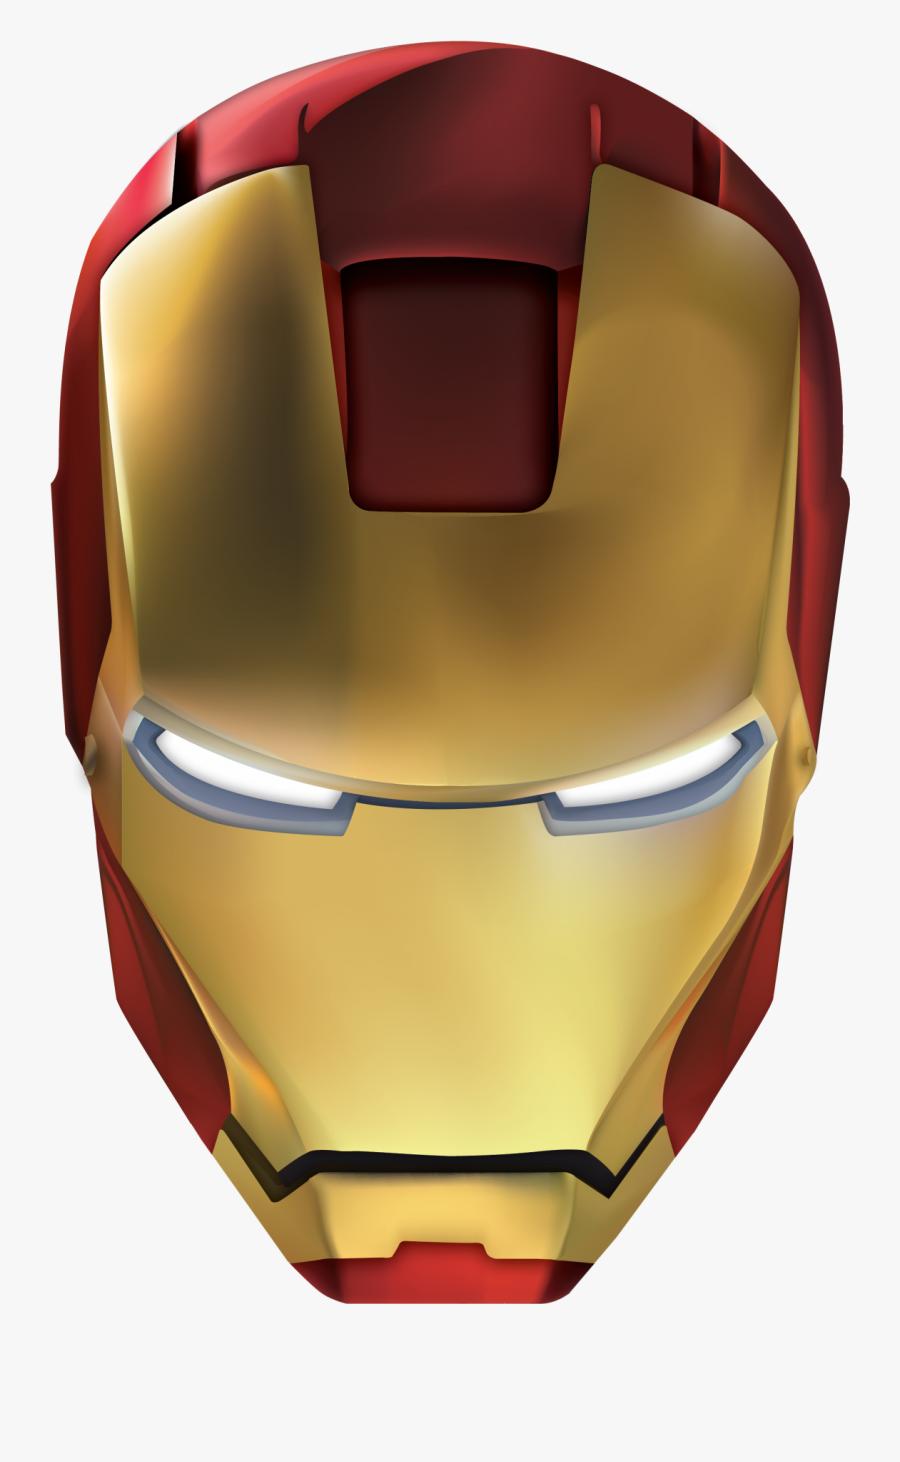 Iron Man Helmet Png, Transparent Clipart